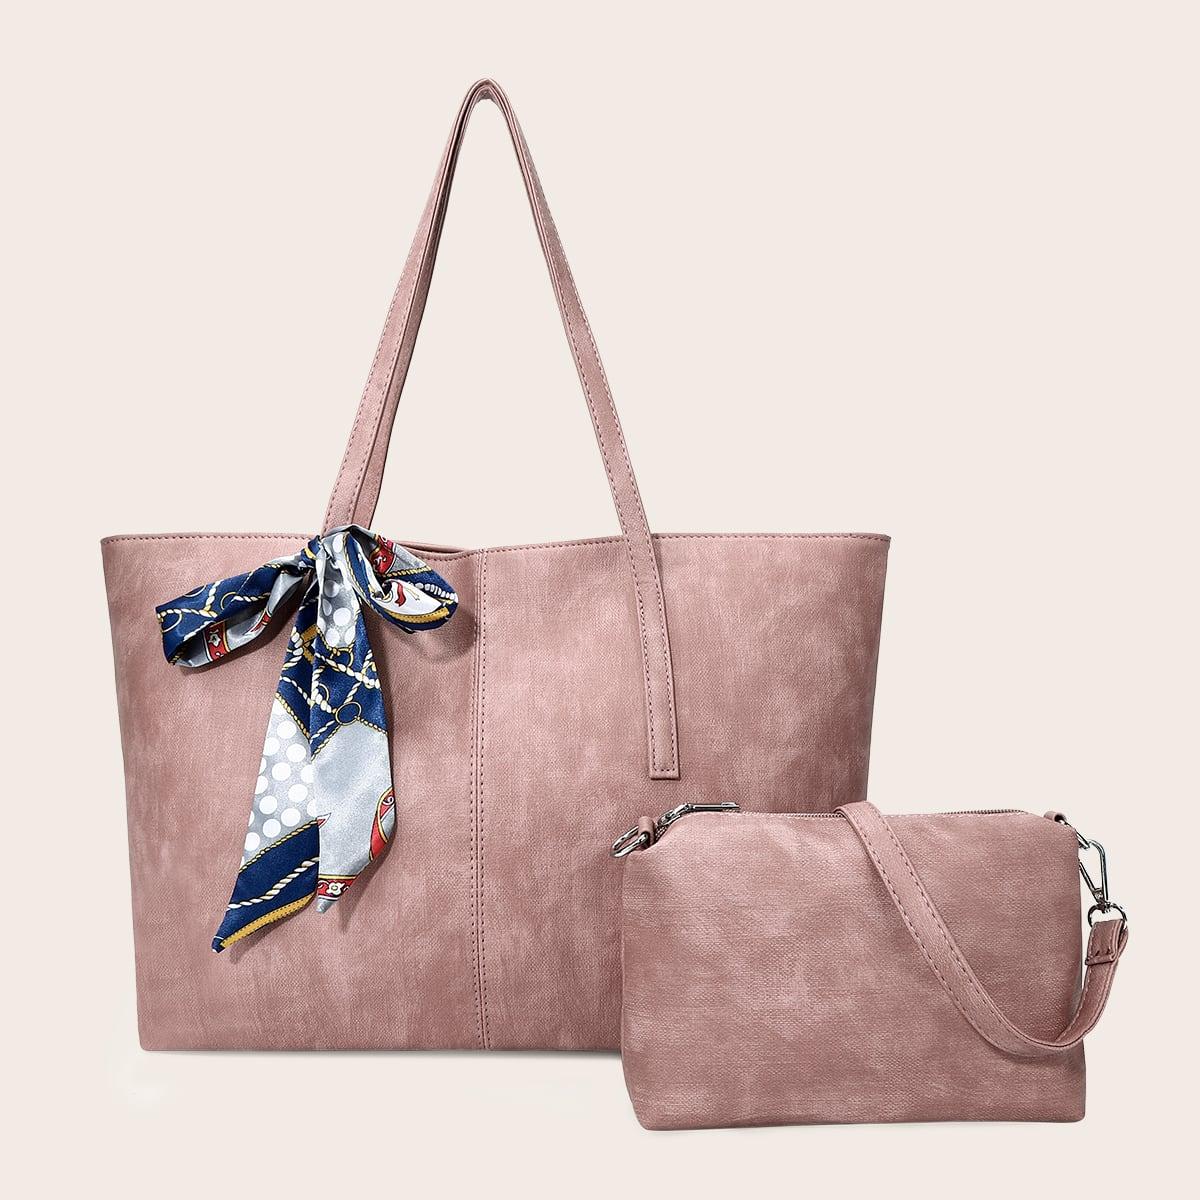 2шт Набор сумок с декором платка